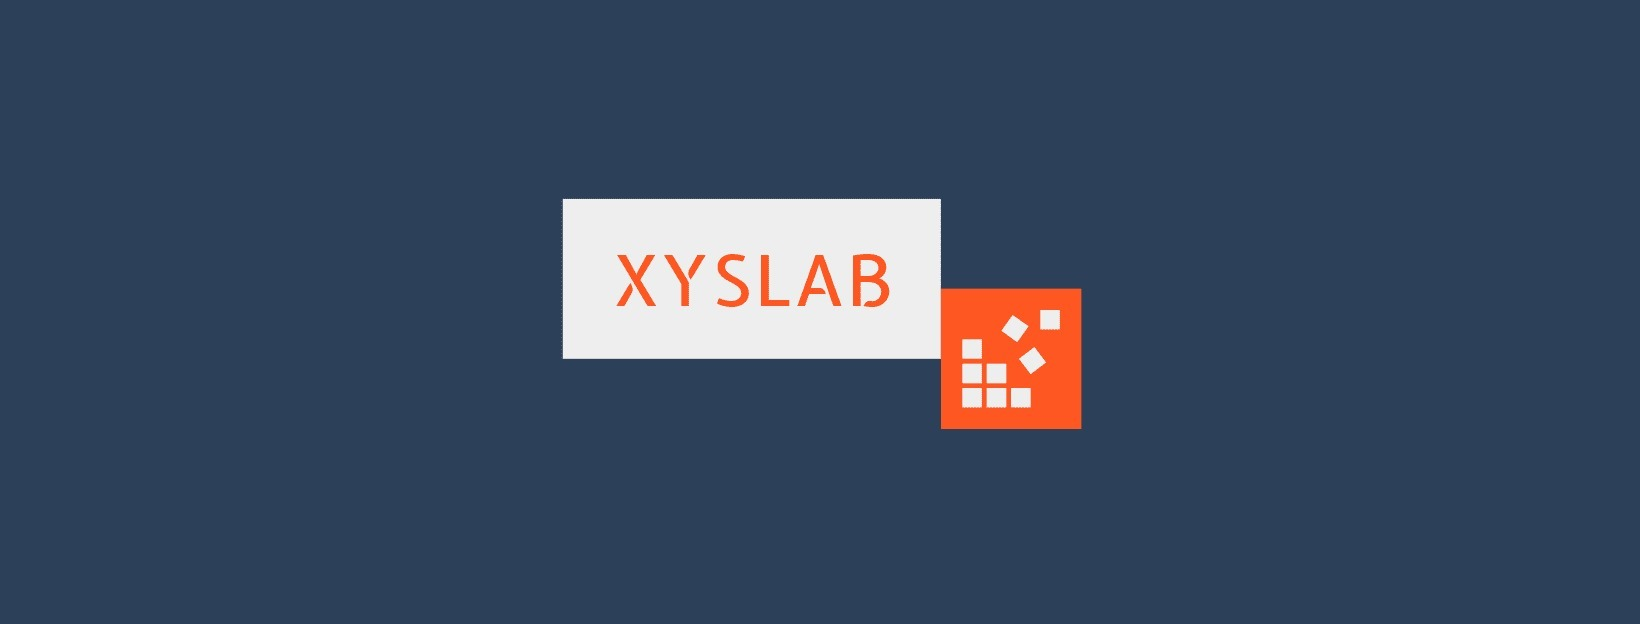 XYSLAB (@xyslab) Cover Image